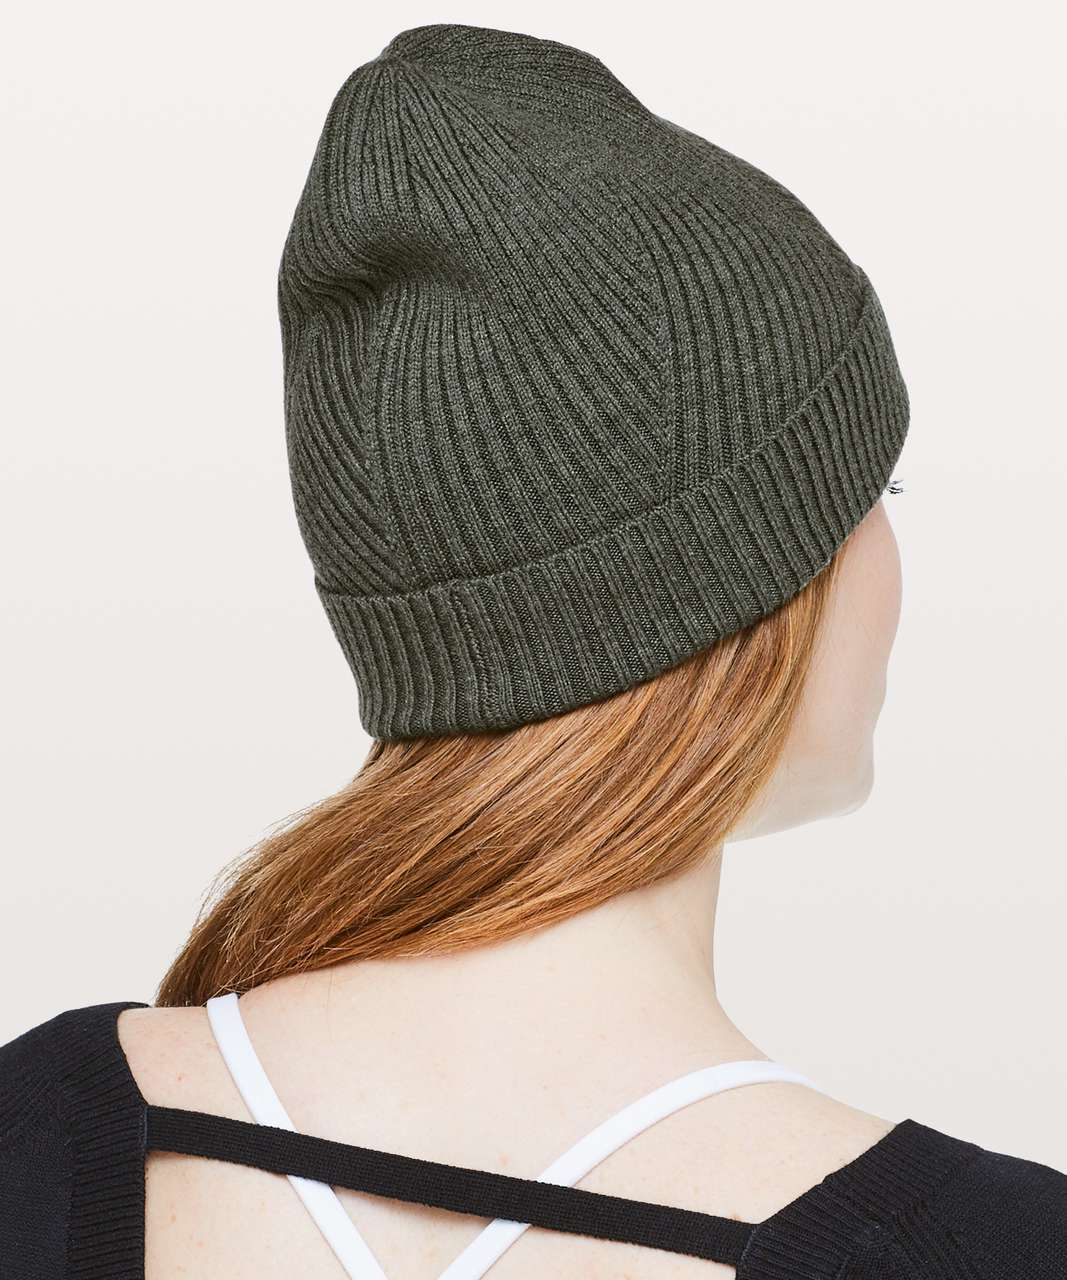 9c857b2e17a28 Lululemon Twist Of Cozy Knit Beanie - Heathered Camo Green - lulu ...